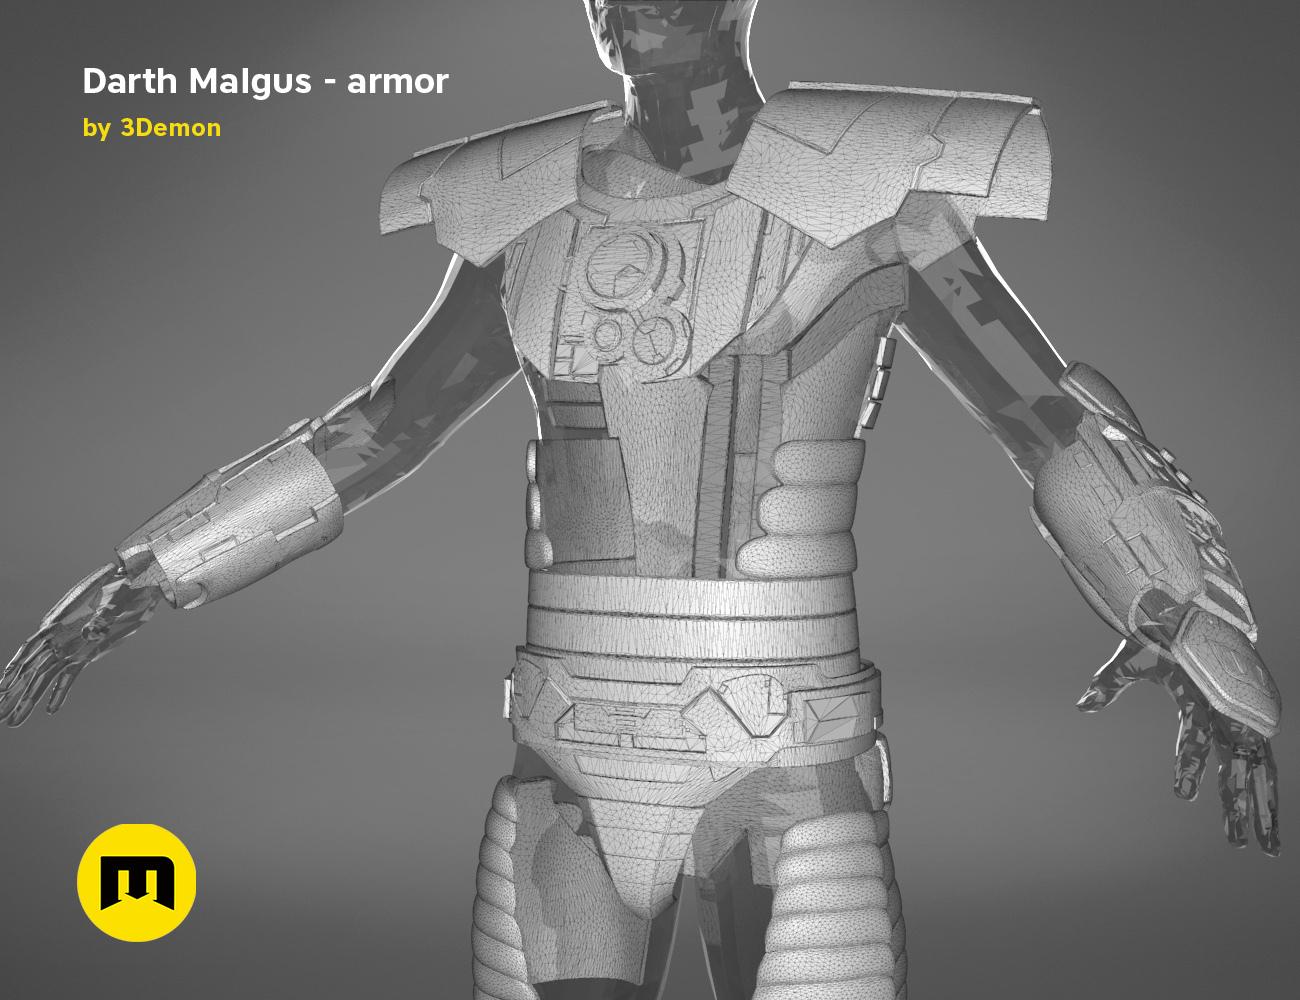 render_scene_darth-malgus-armor-mesh.19 kopie.jpg Download STL file Darth Malgus's full size armor • Design to 3D print, 3D-mon